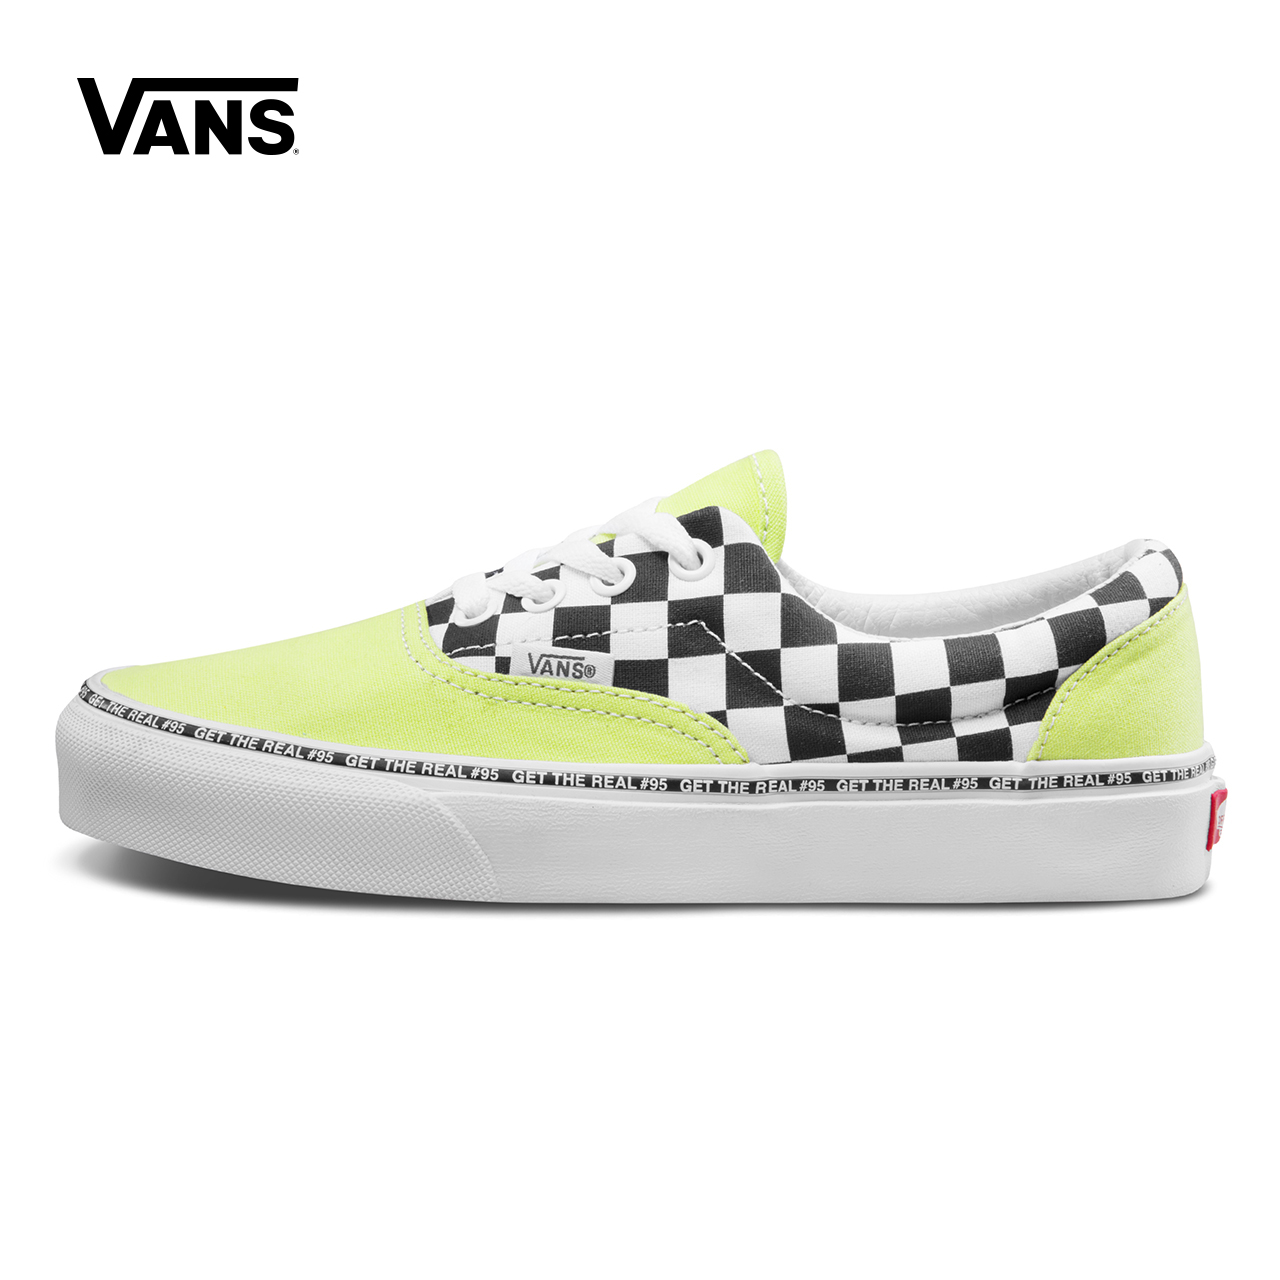 Vans范斯 经典系列 Era帆布鞋 GET THE REAL#95低帮男女官方正品